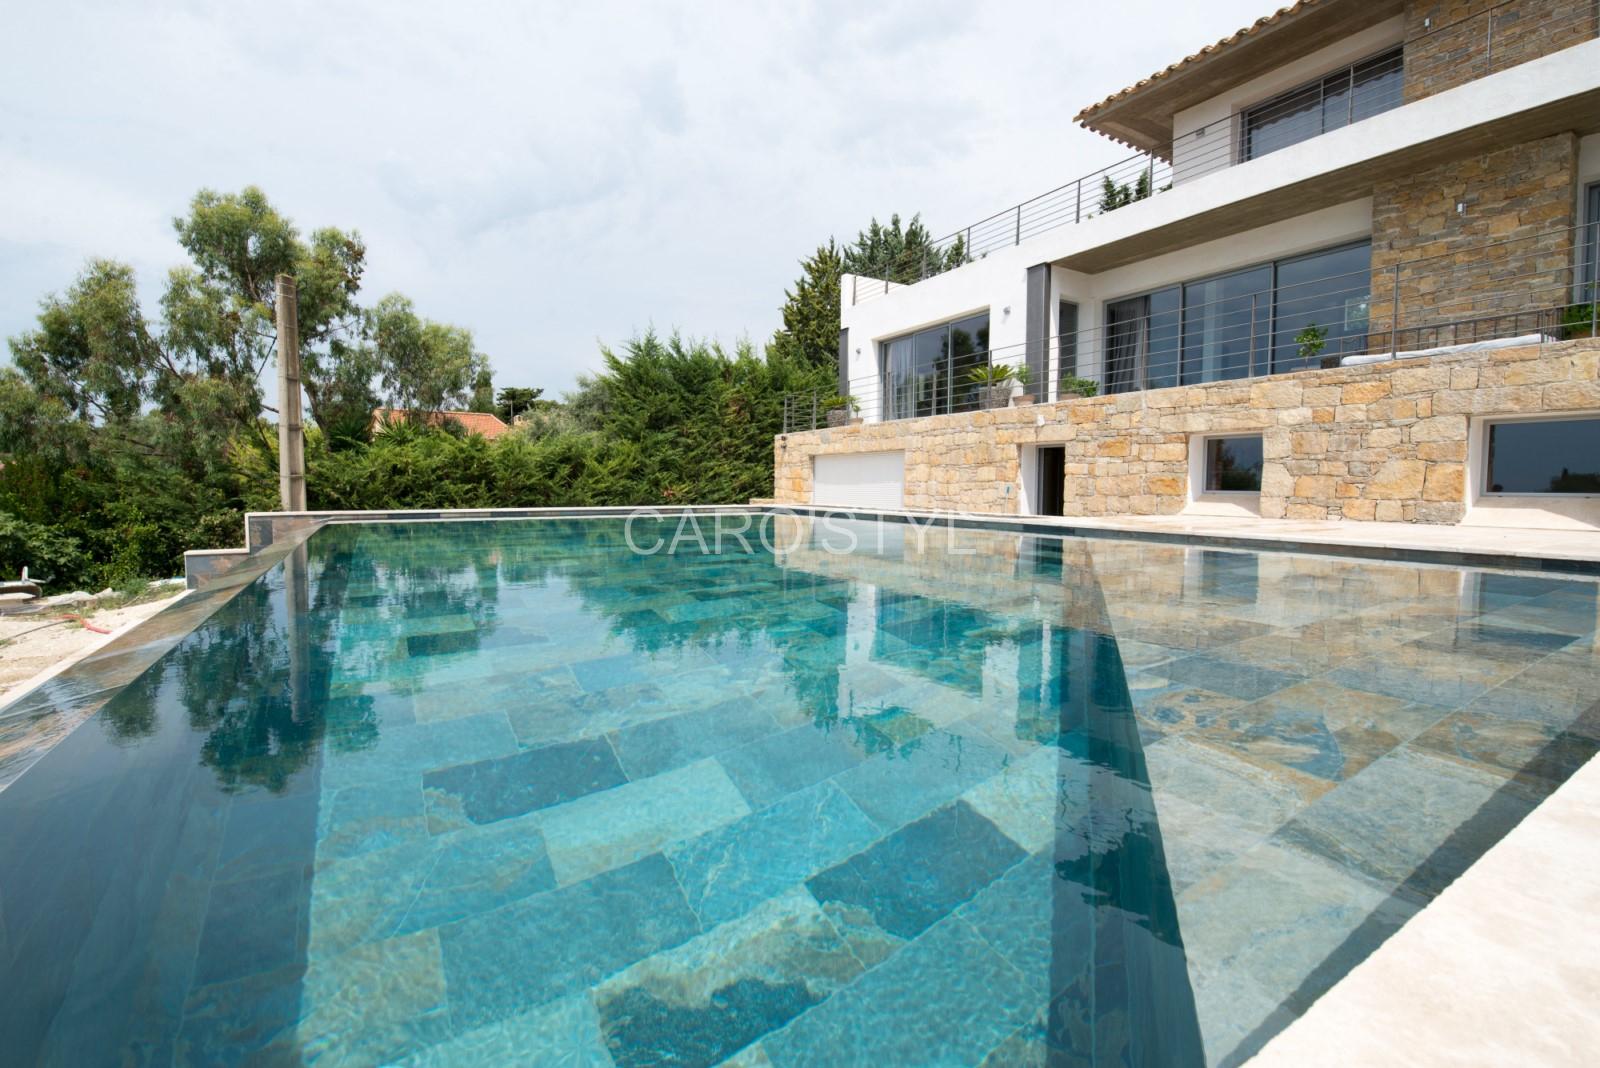 Piscine En Carrelage Green Bali® 30X60 Cm Grand Format, Aux ... à Carrelage Piscine Bali 30X60